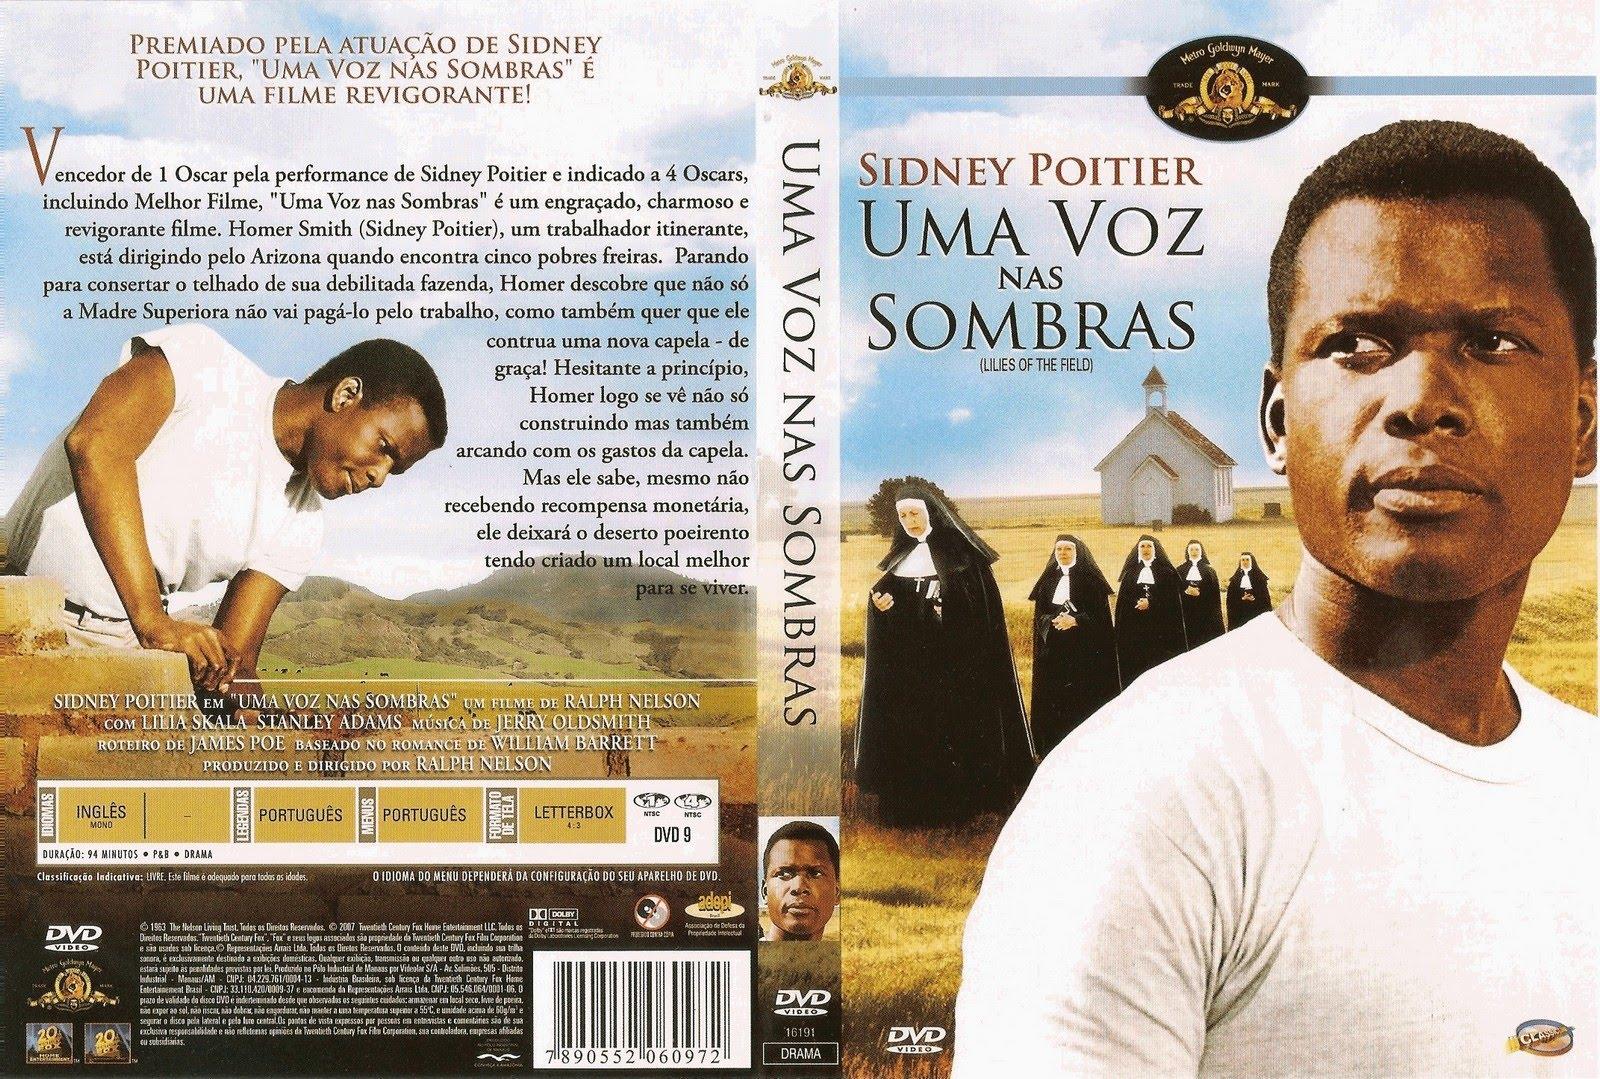 http://1.bp.blogspot.com/_WHxjd2HO-SQ/S-mrvSQwutI/AAAAAAAAAo8/d15RuynYYsw/s1600/Uma-Voz-Nas-Sombras.jpg